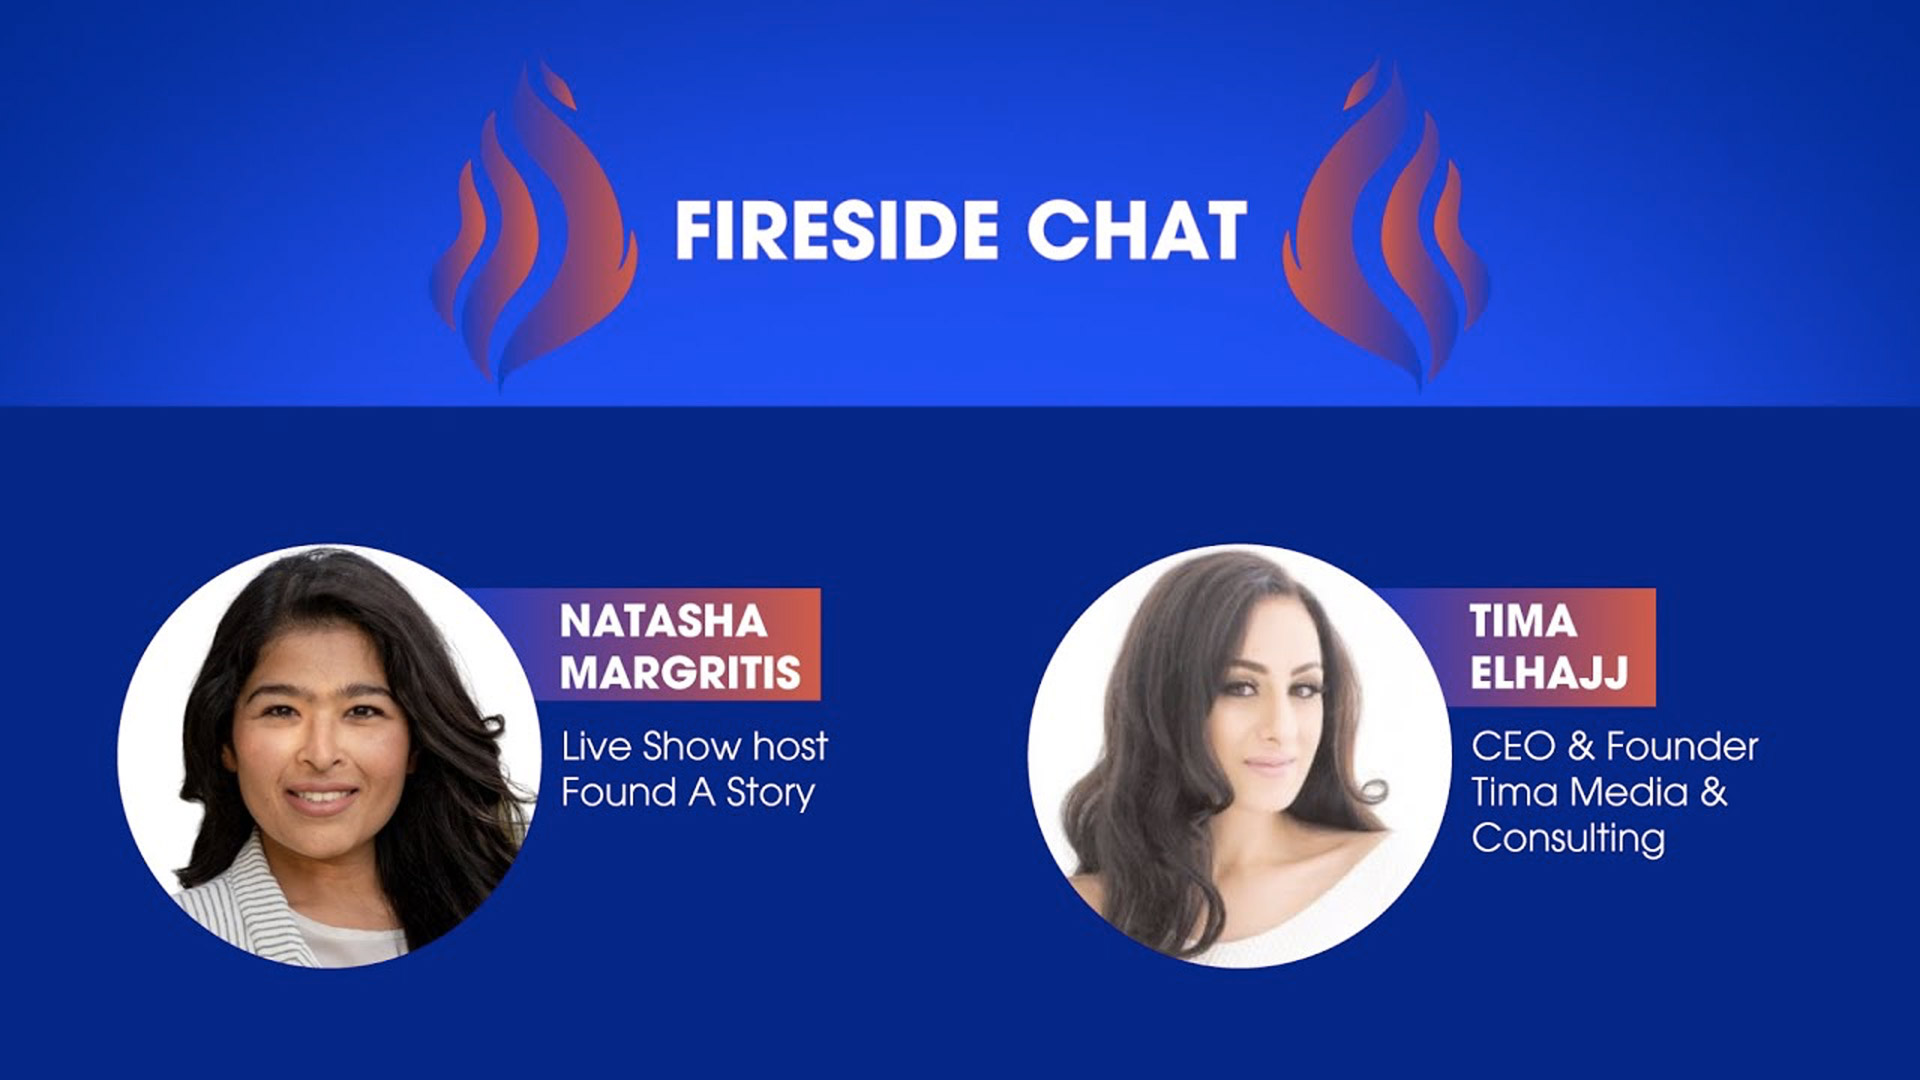 Fireside Chat with Natasha Margaritis and Tima Elhajj